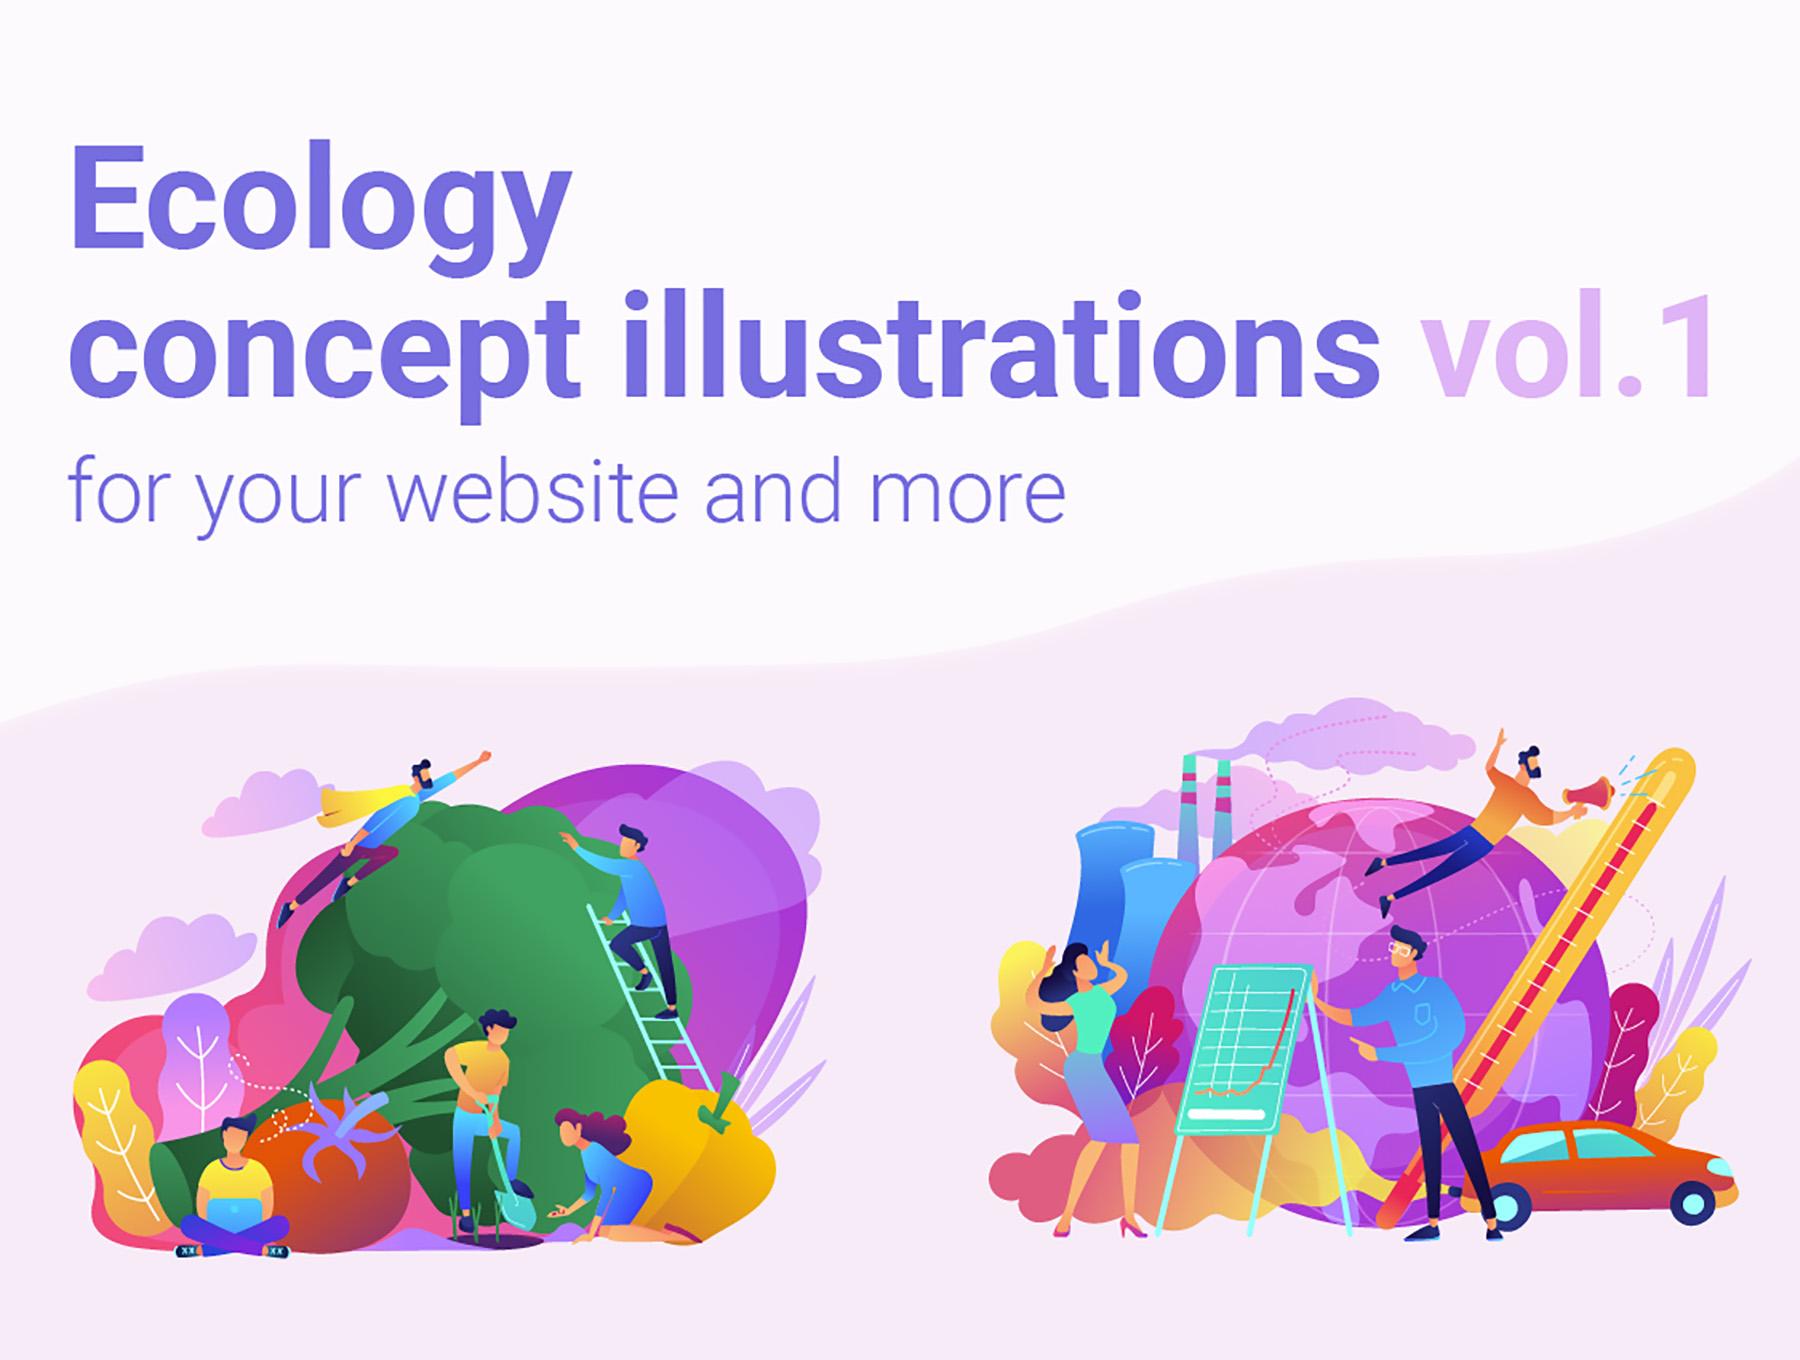 organic_ecology_concepts_vol1-cover-02_15594157458.jpg